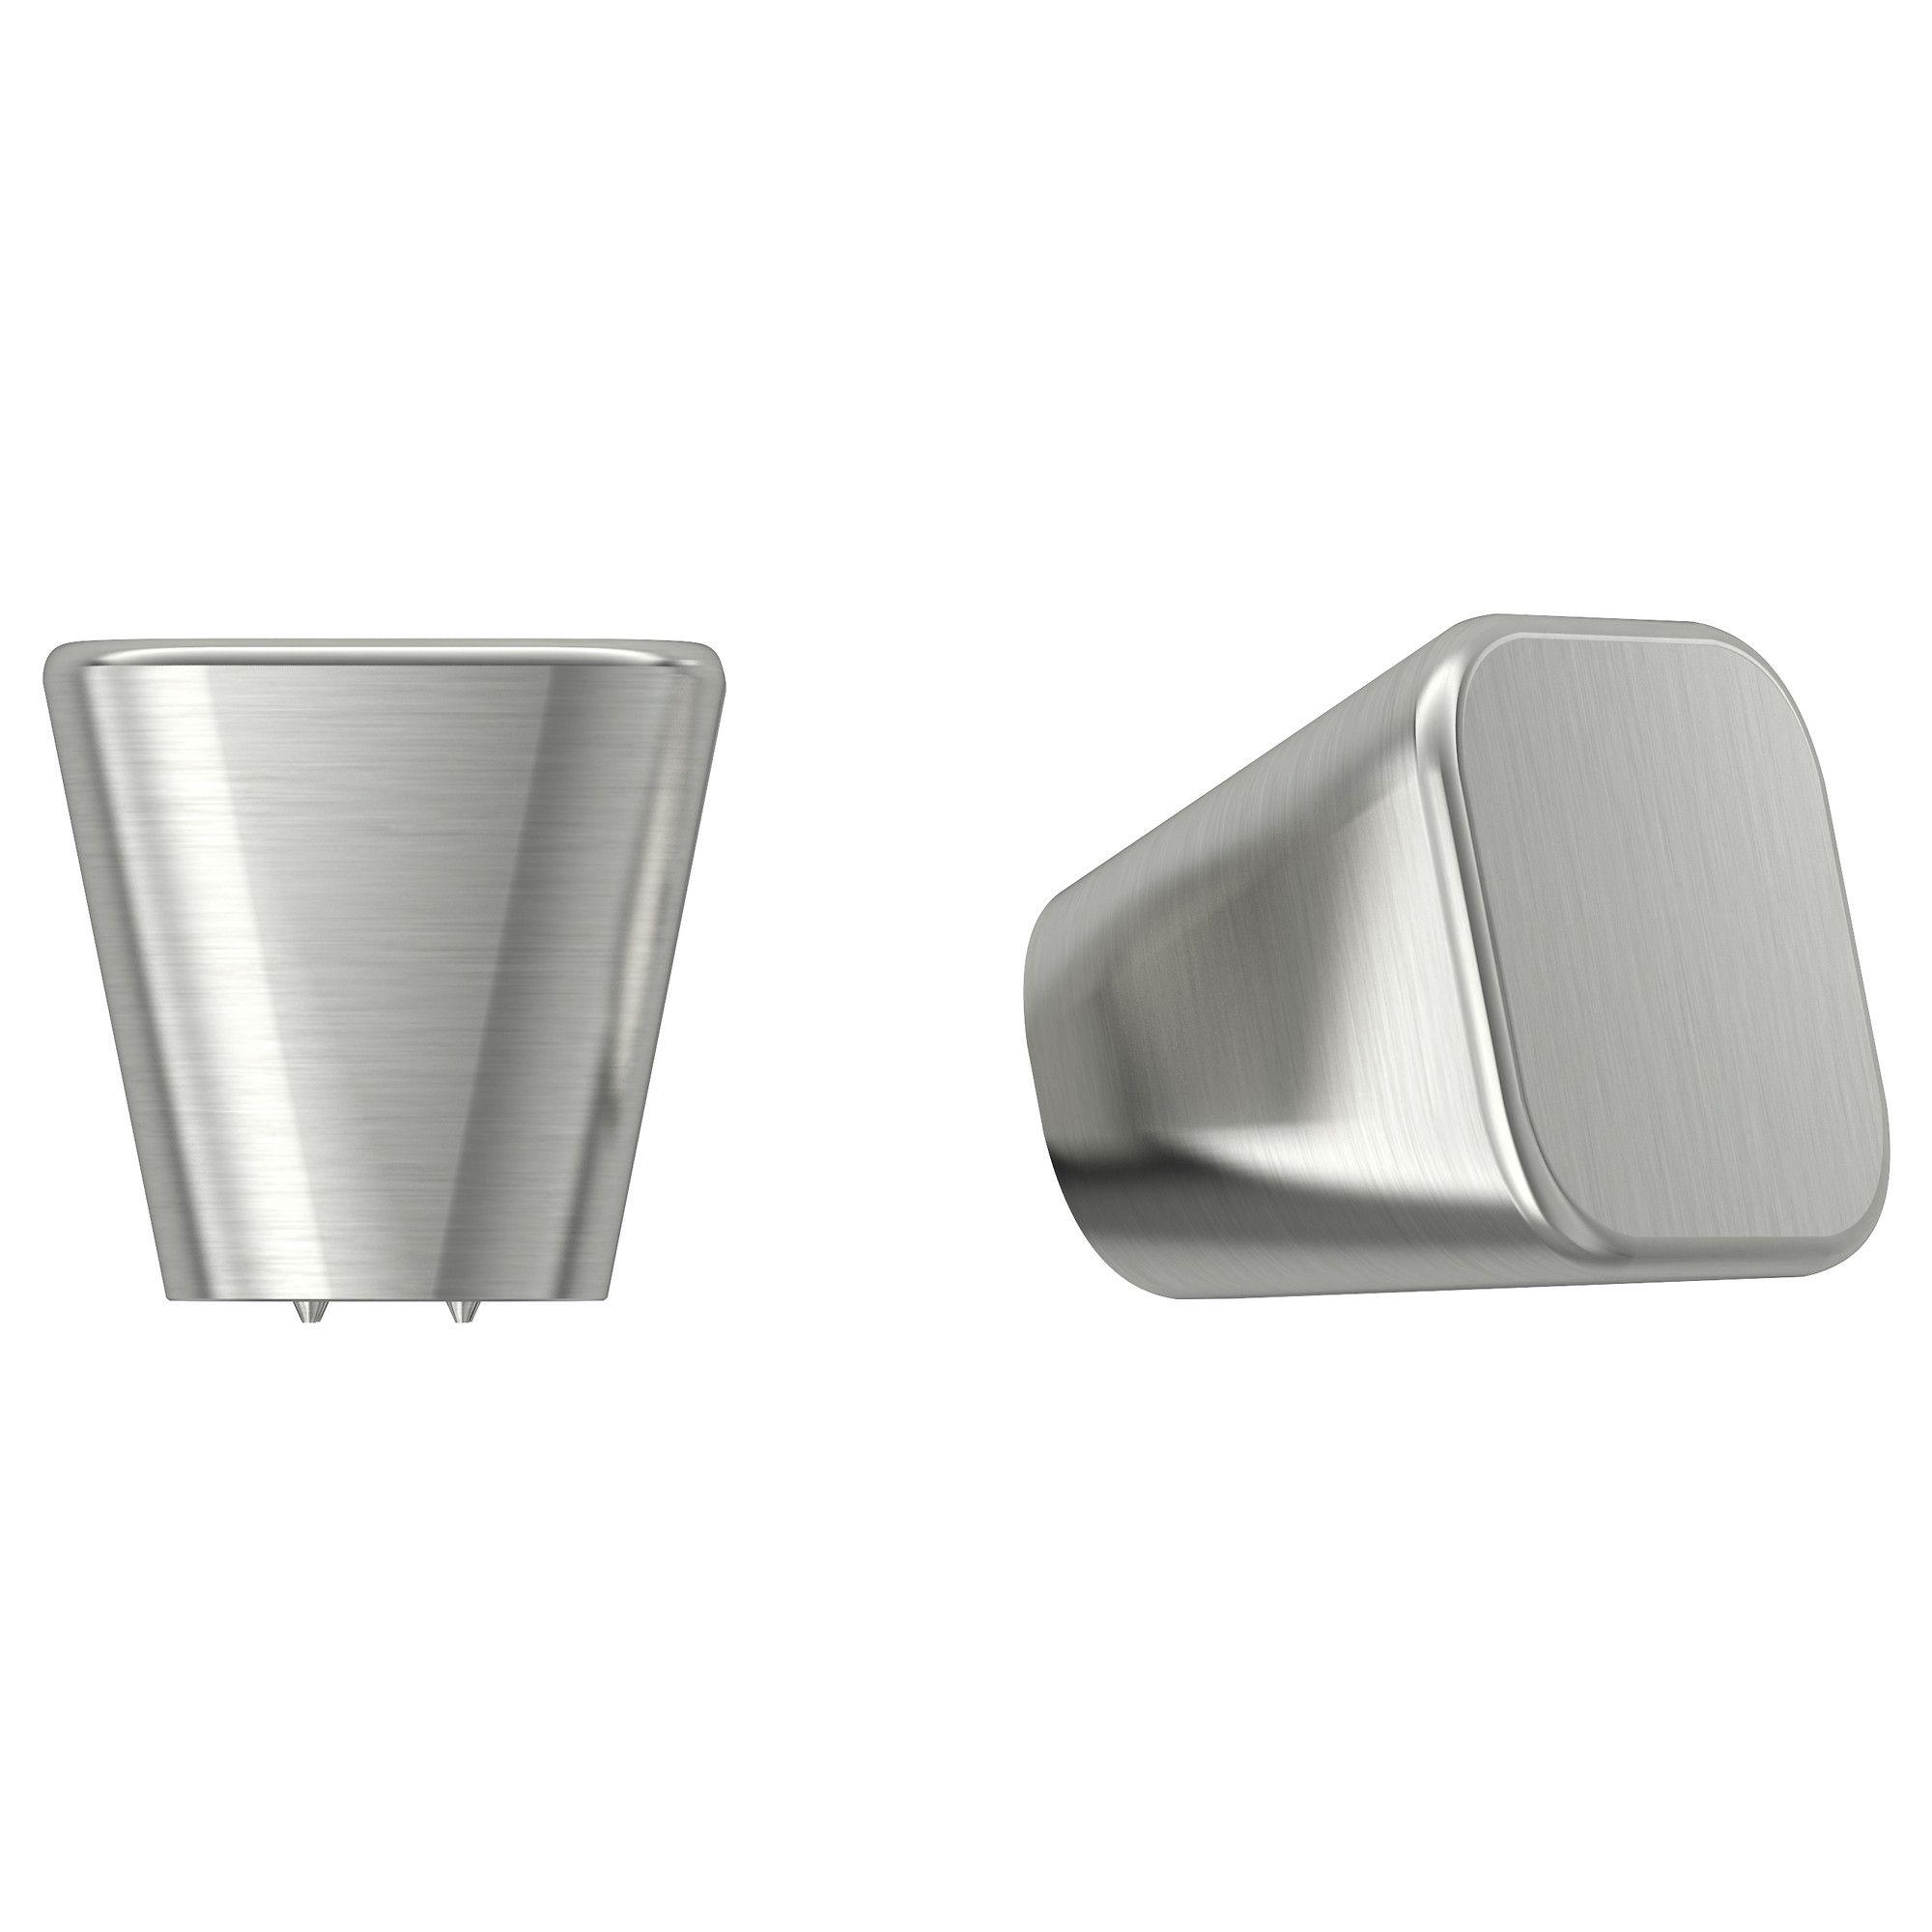 Ikea Kitchen Hardware: Kitchen Cabinet Hardware BASTIG Knob - IKEA